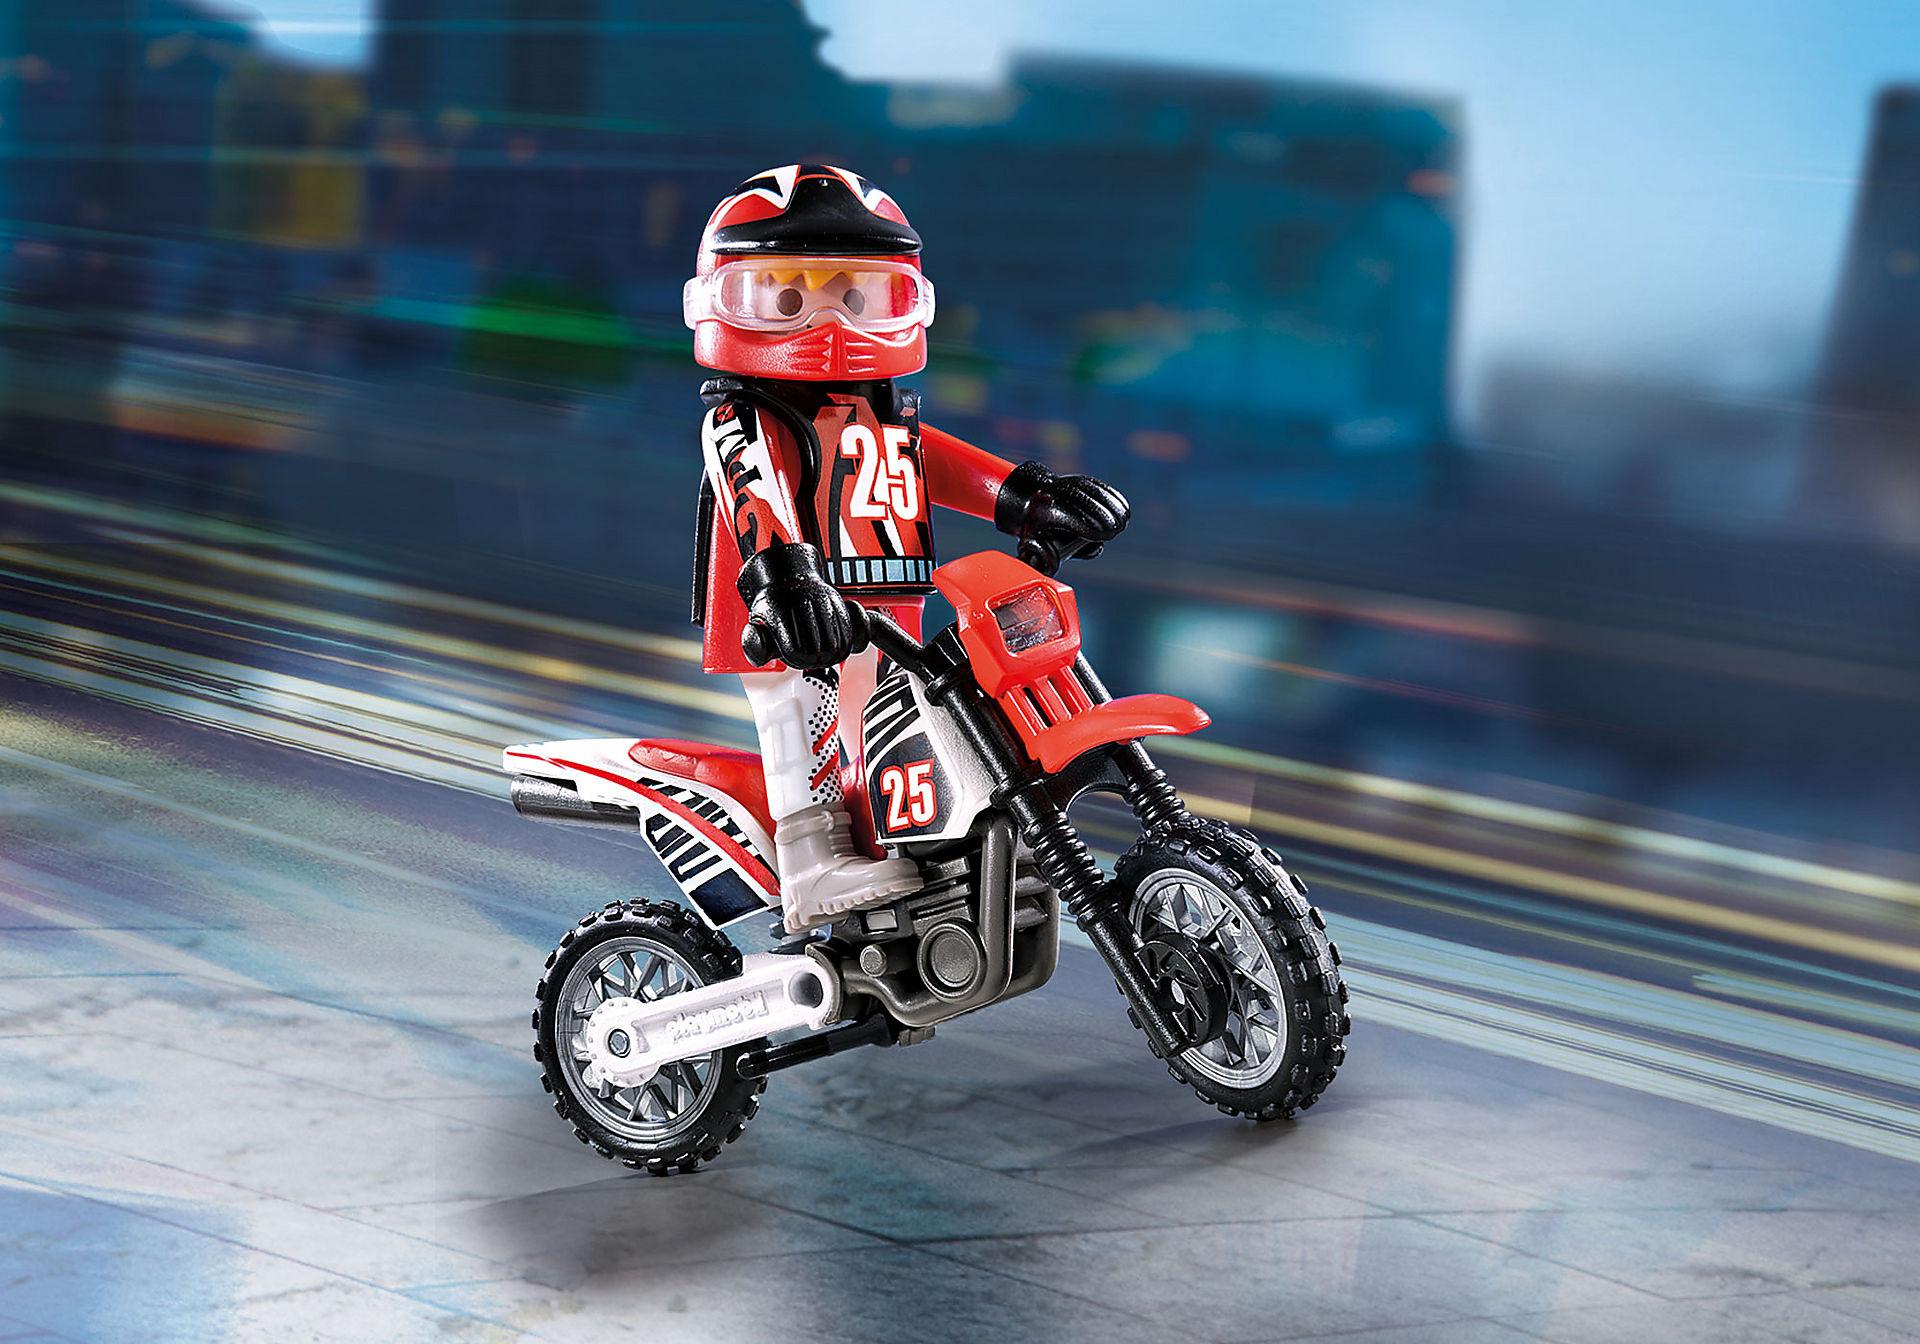 9357 Motocrossförare zoom image1